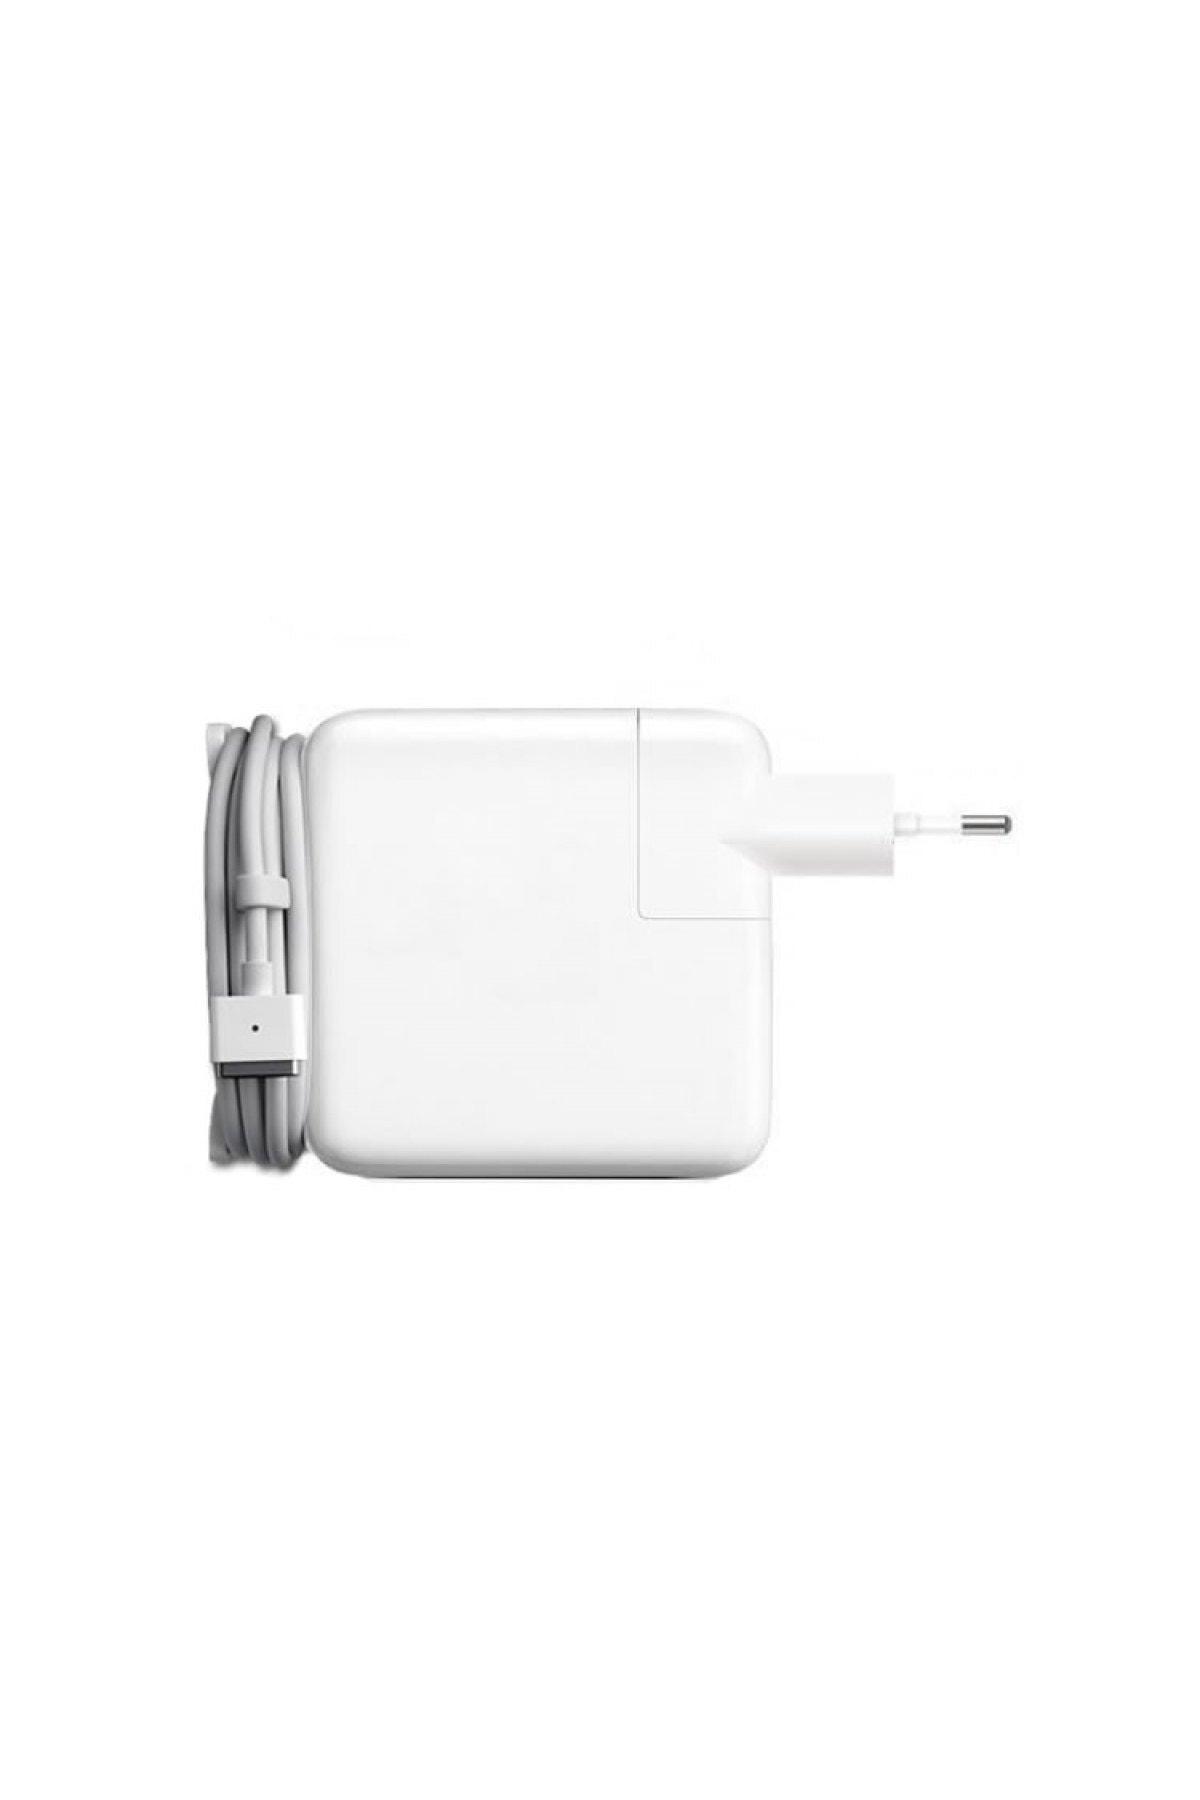 İnfomax Apple Macbook Air A1346, A1436, A1465, A1466 Adaptör Şarj Aleti 1